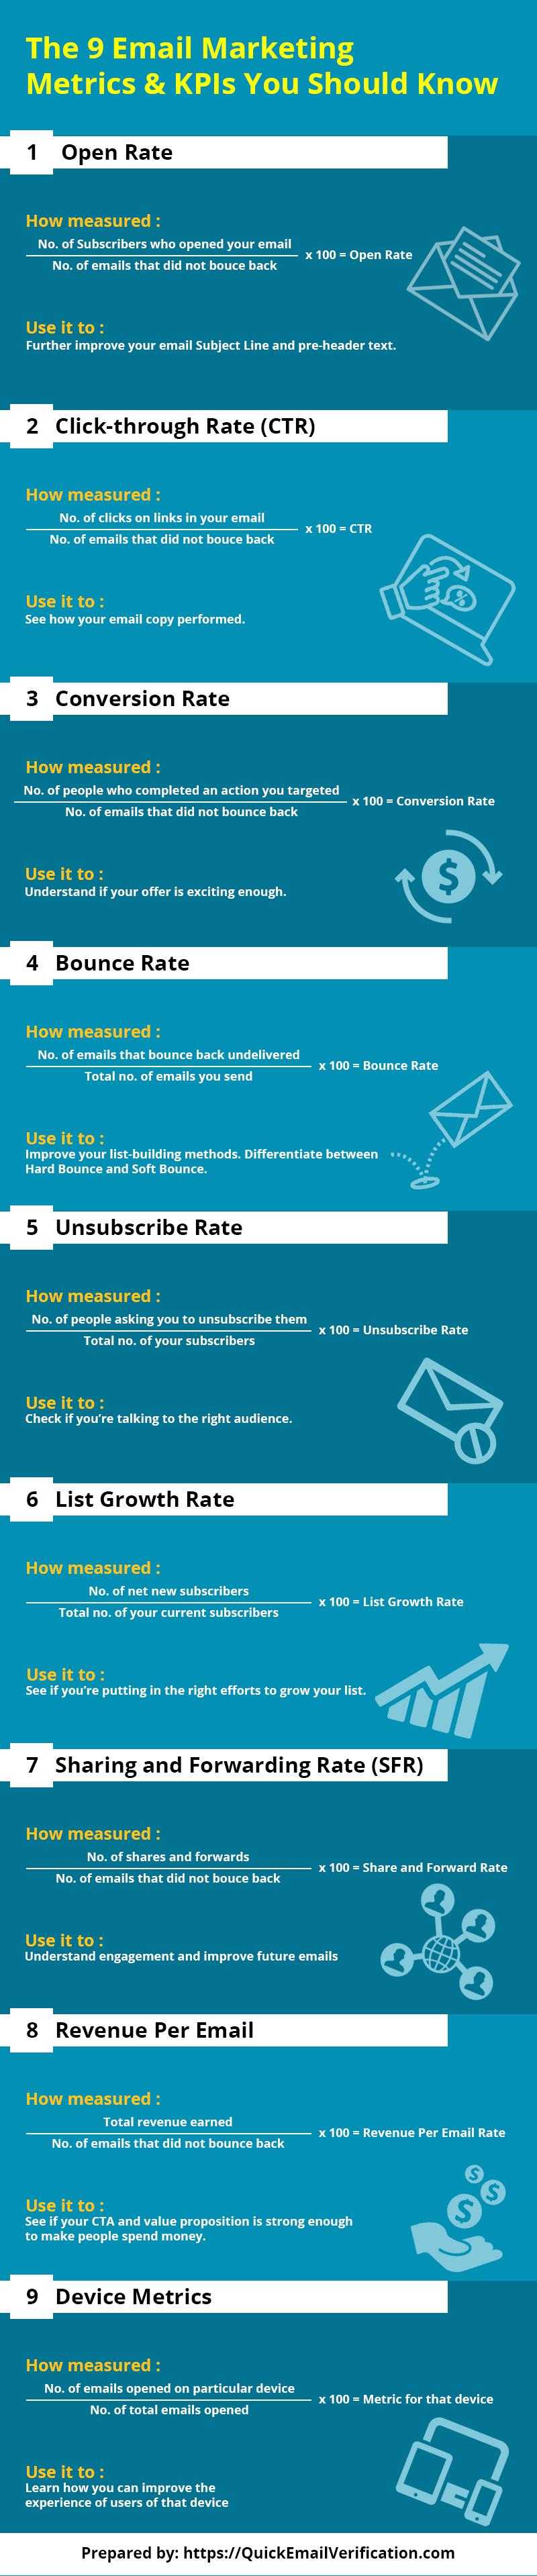 email-marketing-metrics-KPIs-important